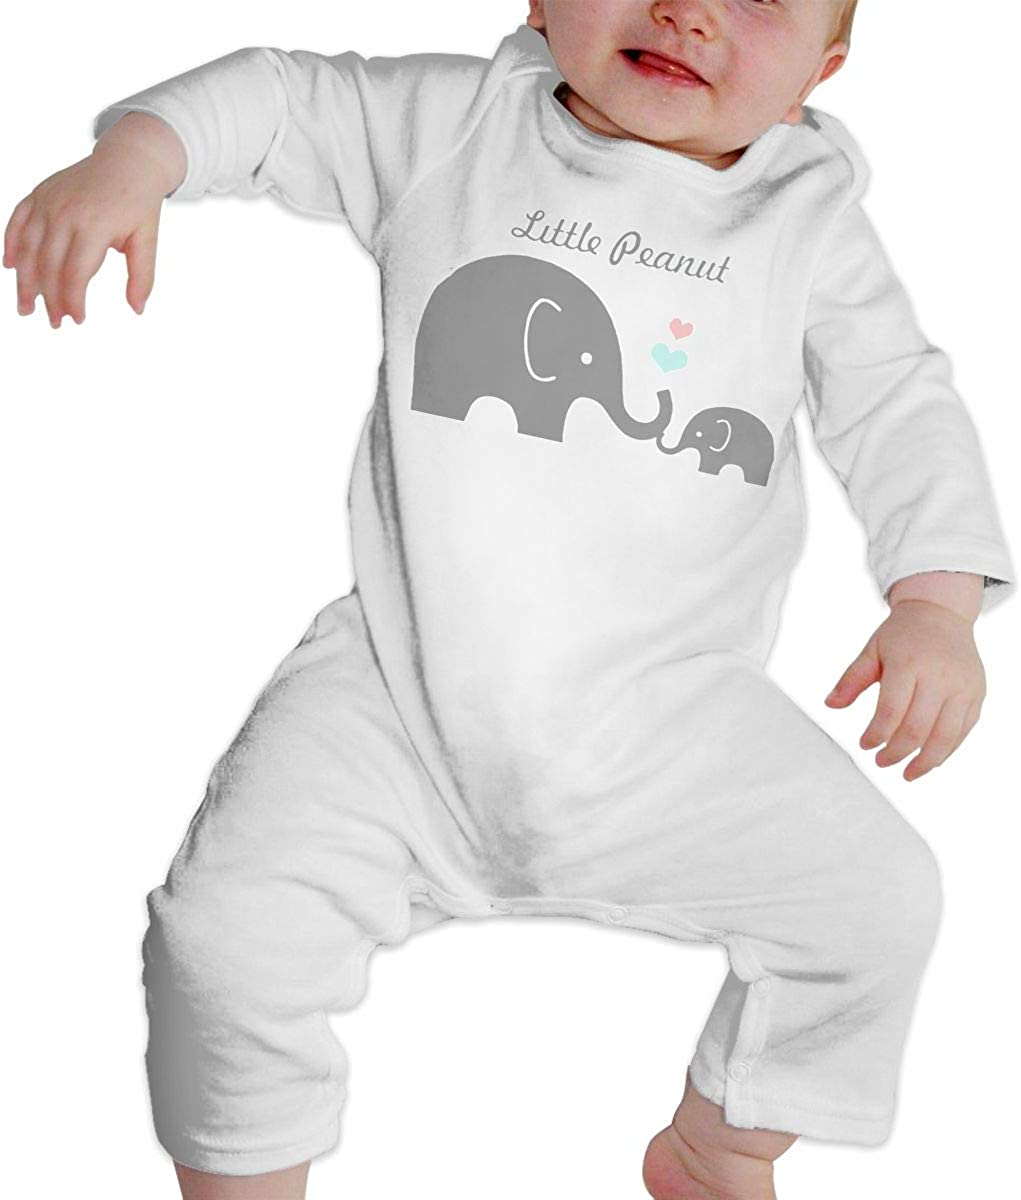 Little Peanut Elephant Toddler Bodysuit Onesie Cute Romper Clothes